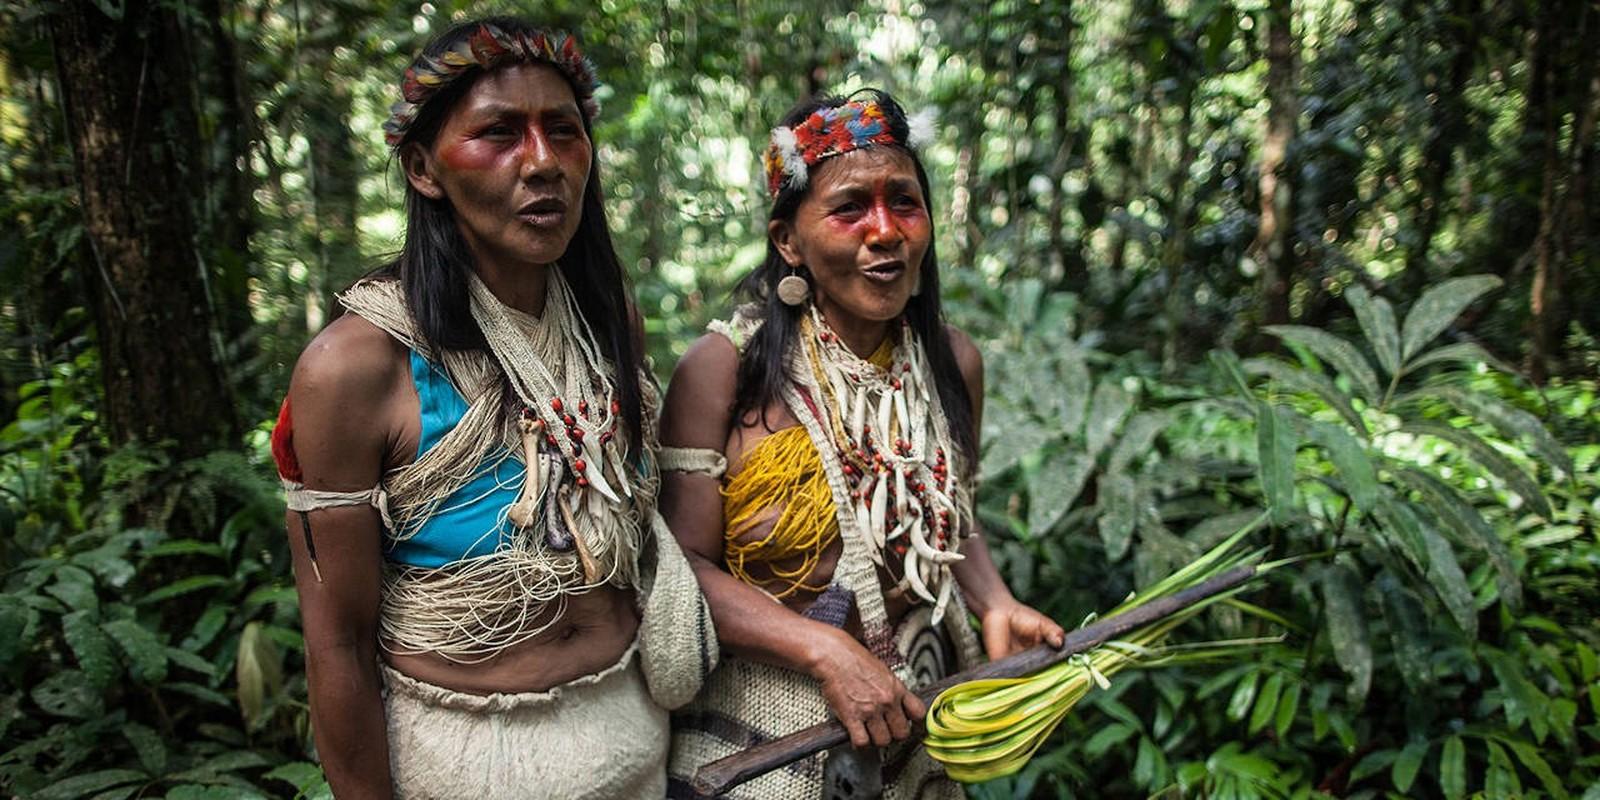 Dieu bat ngo ve khu rung nhiet doi Amazon noi tieng the gioi-Hinh-10